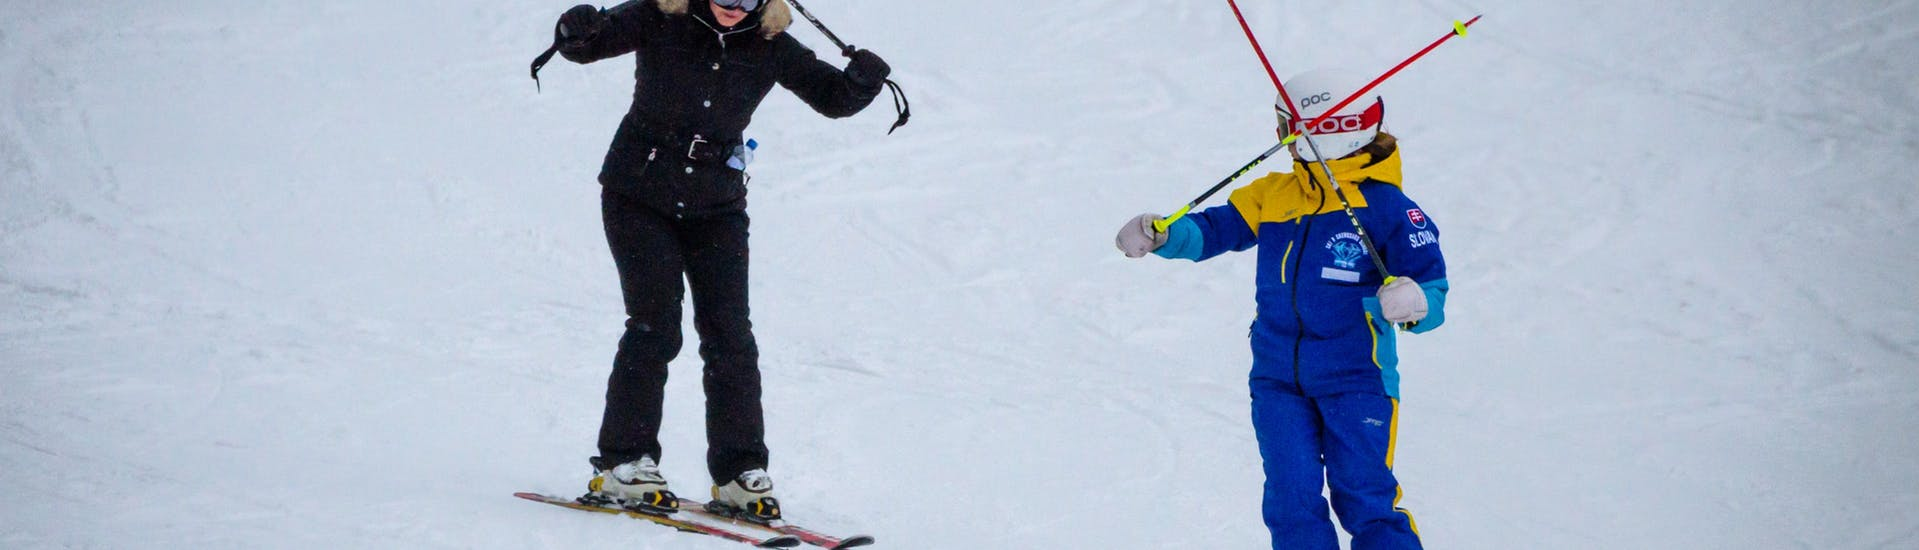 Privé skilessen voor volwassenen voor alle niveaus met Crystal Ski  Demänovská Dolina - Hero image